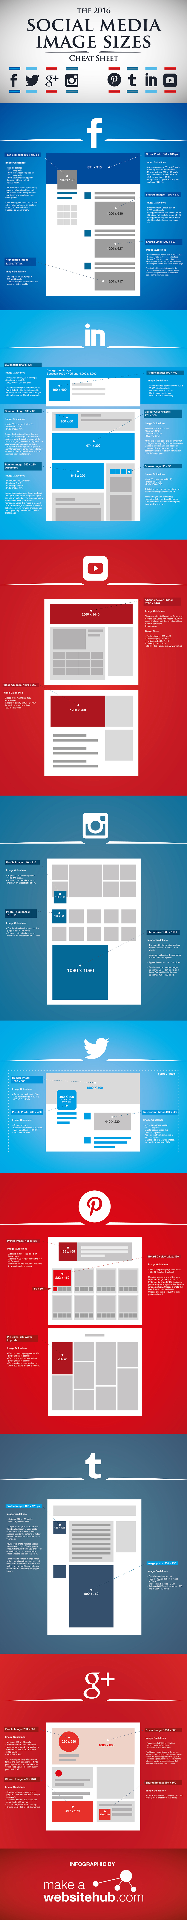 Social Media Image Size Guide 2016